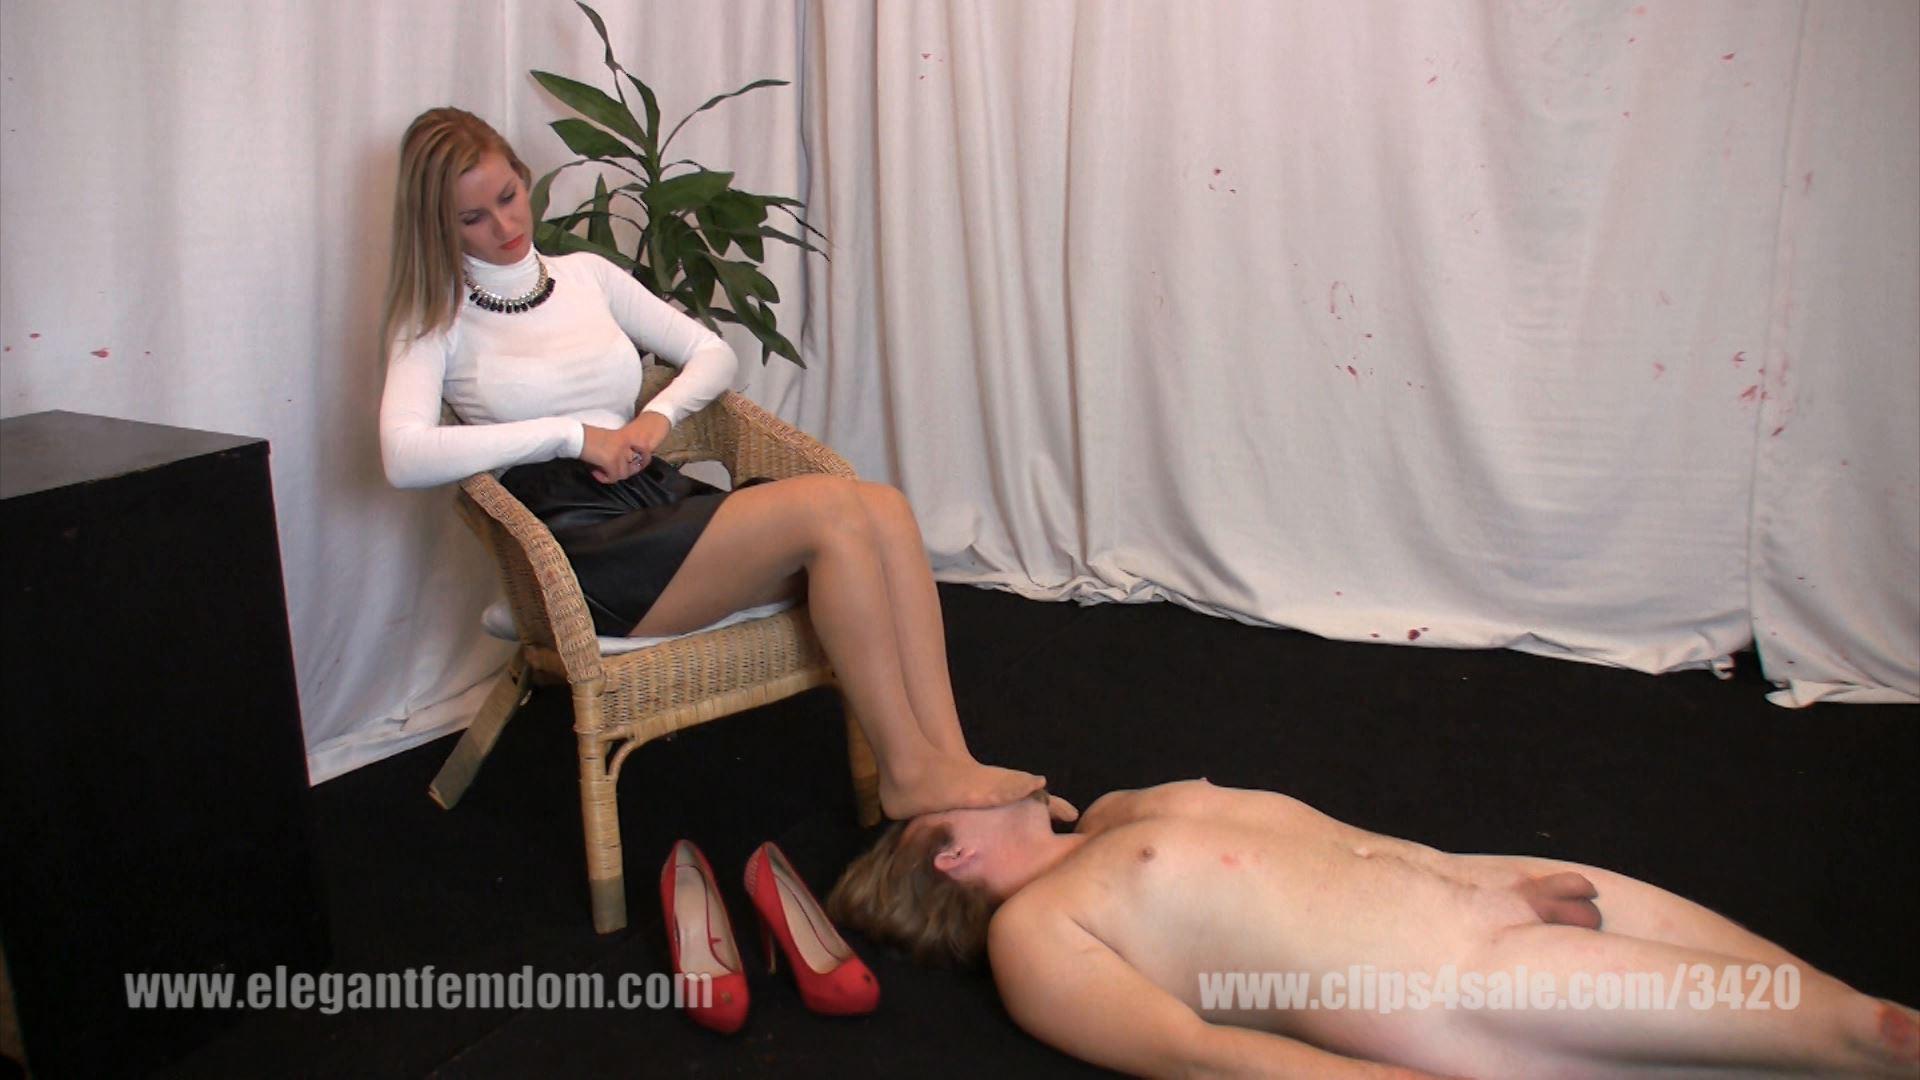 Excellent pantyhose teasing scene - ELEGANTFEMDOM - FULL HD/1080p/MP4